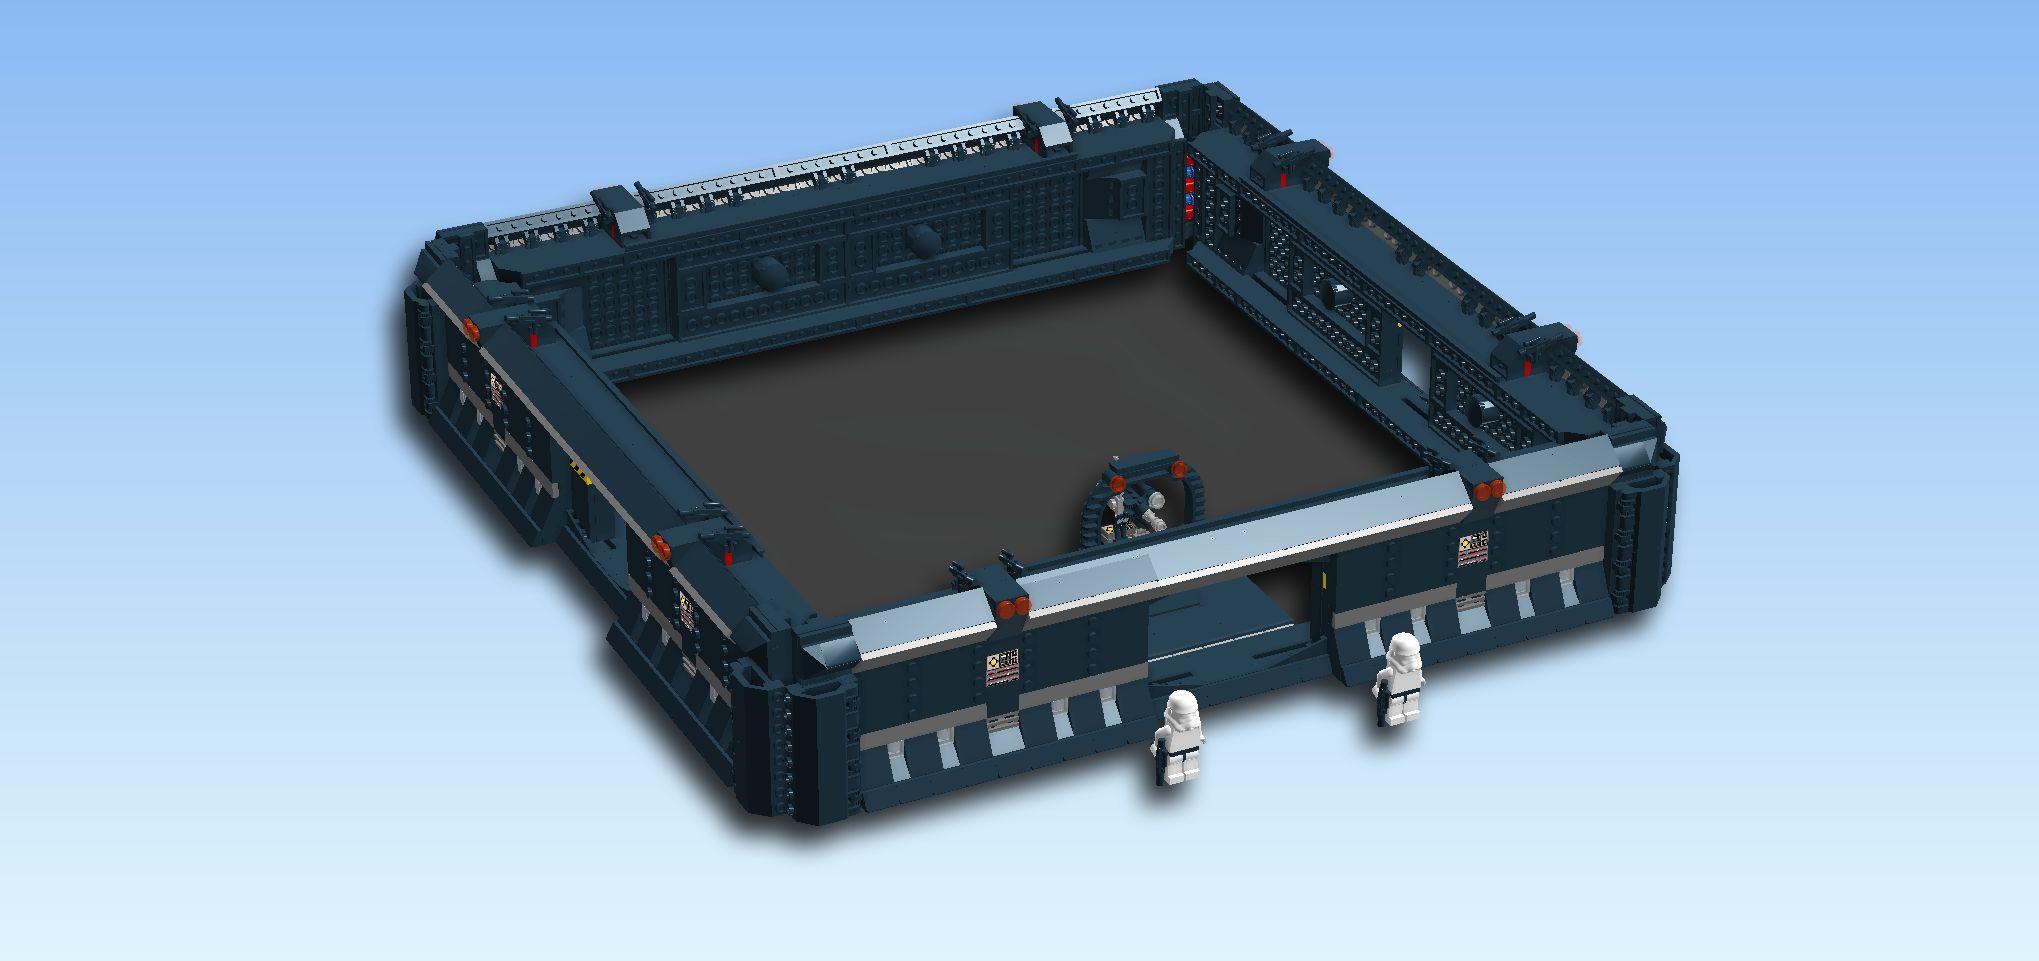 Hangar12